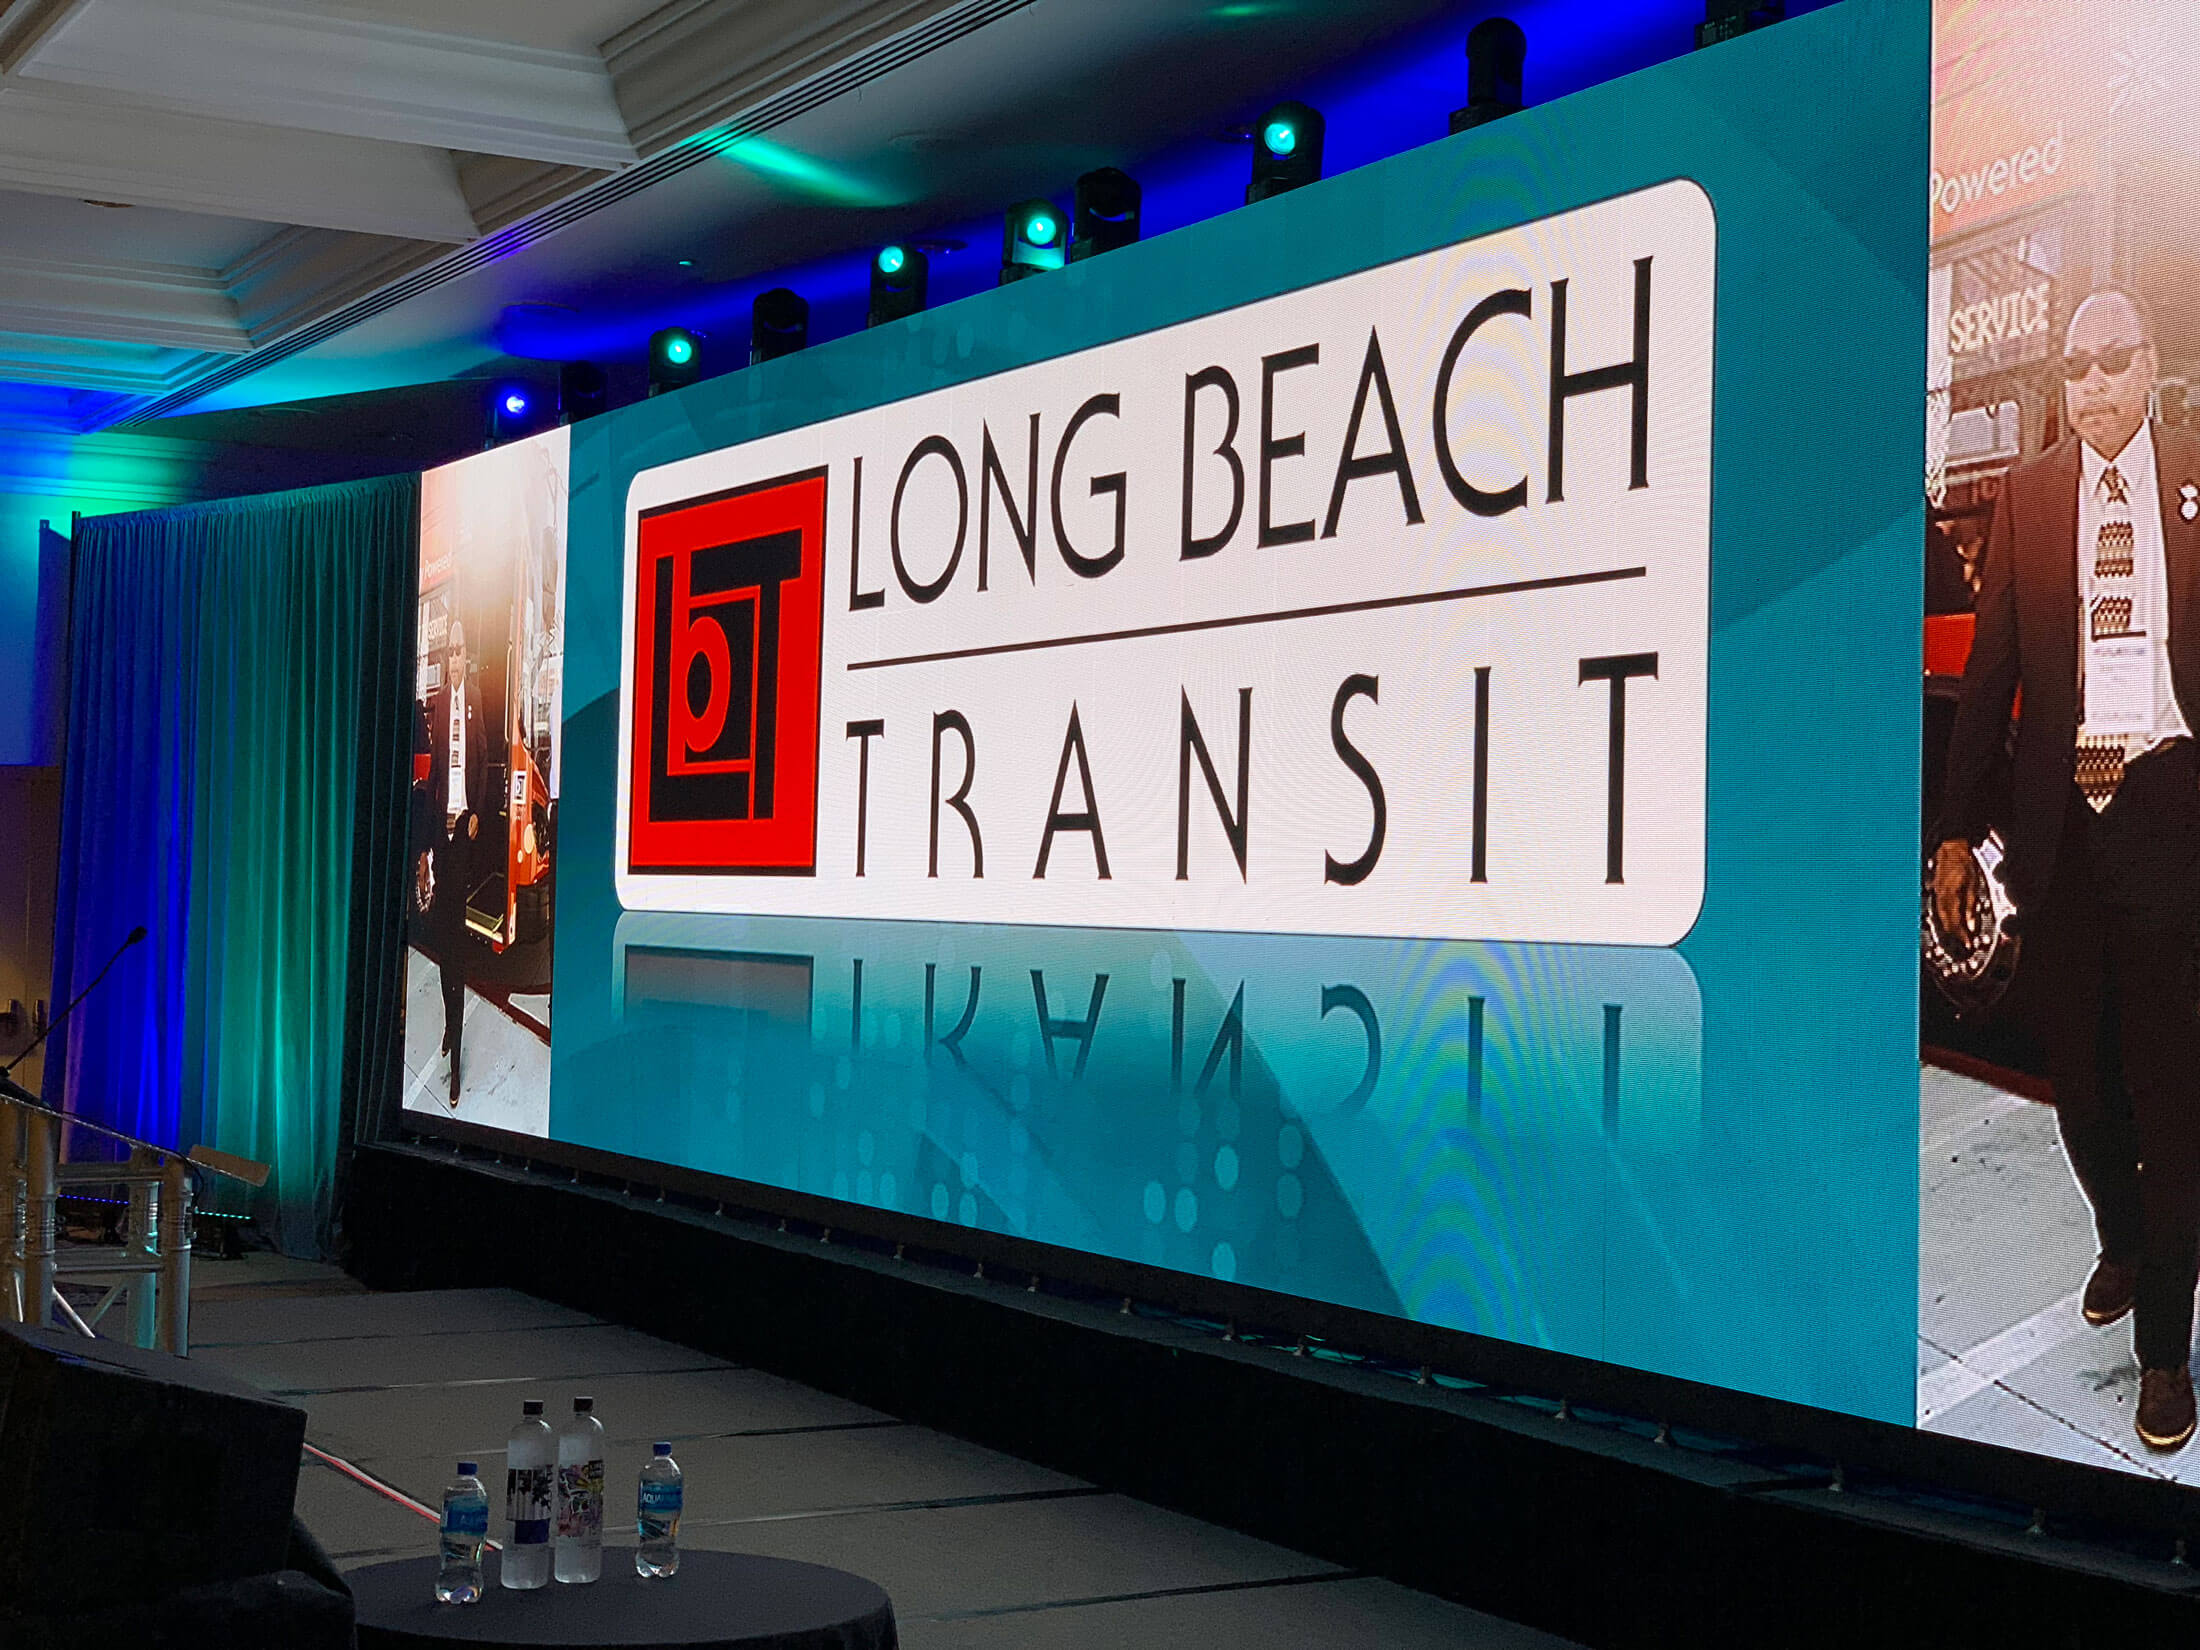 PSI-long-beach-transit